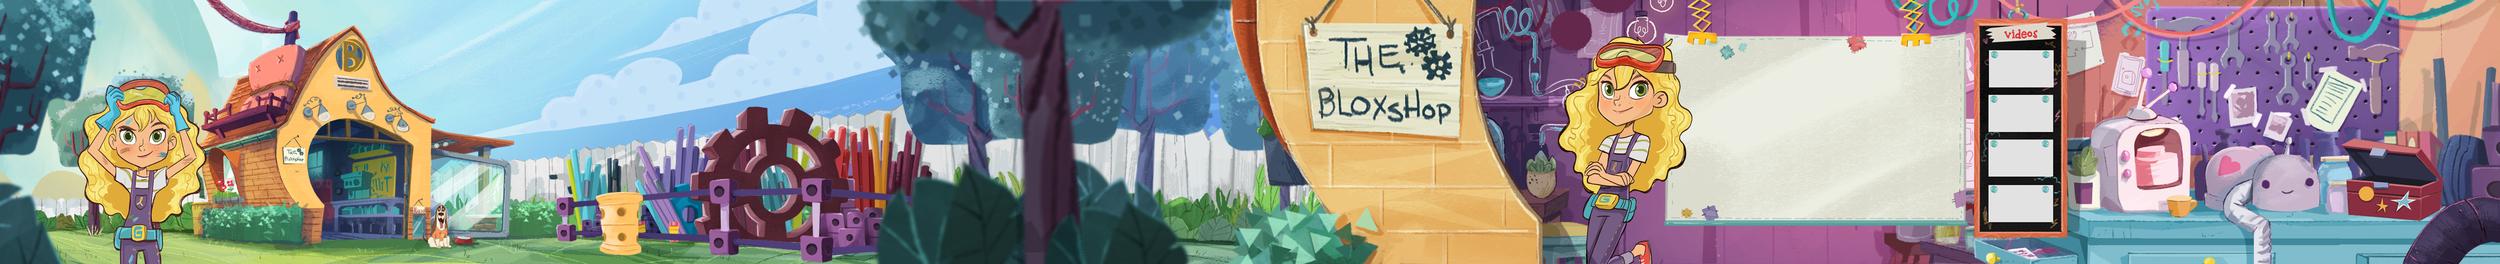 BloxShopLayered_FinalWEB.jpg